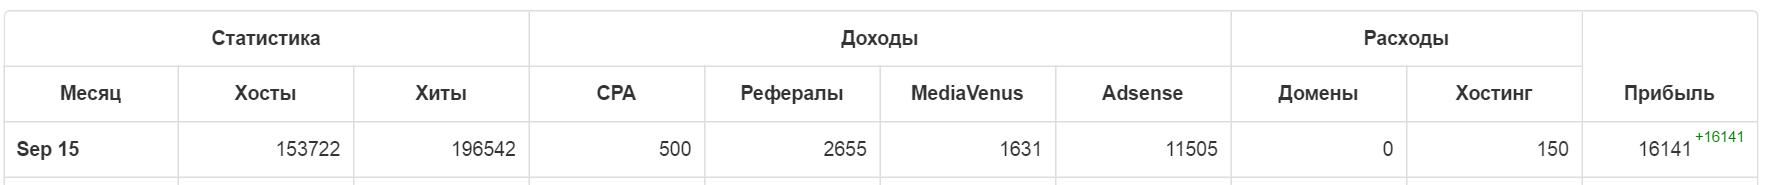 duglas_2